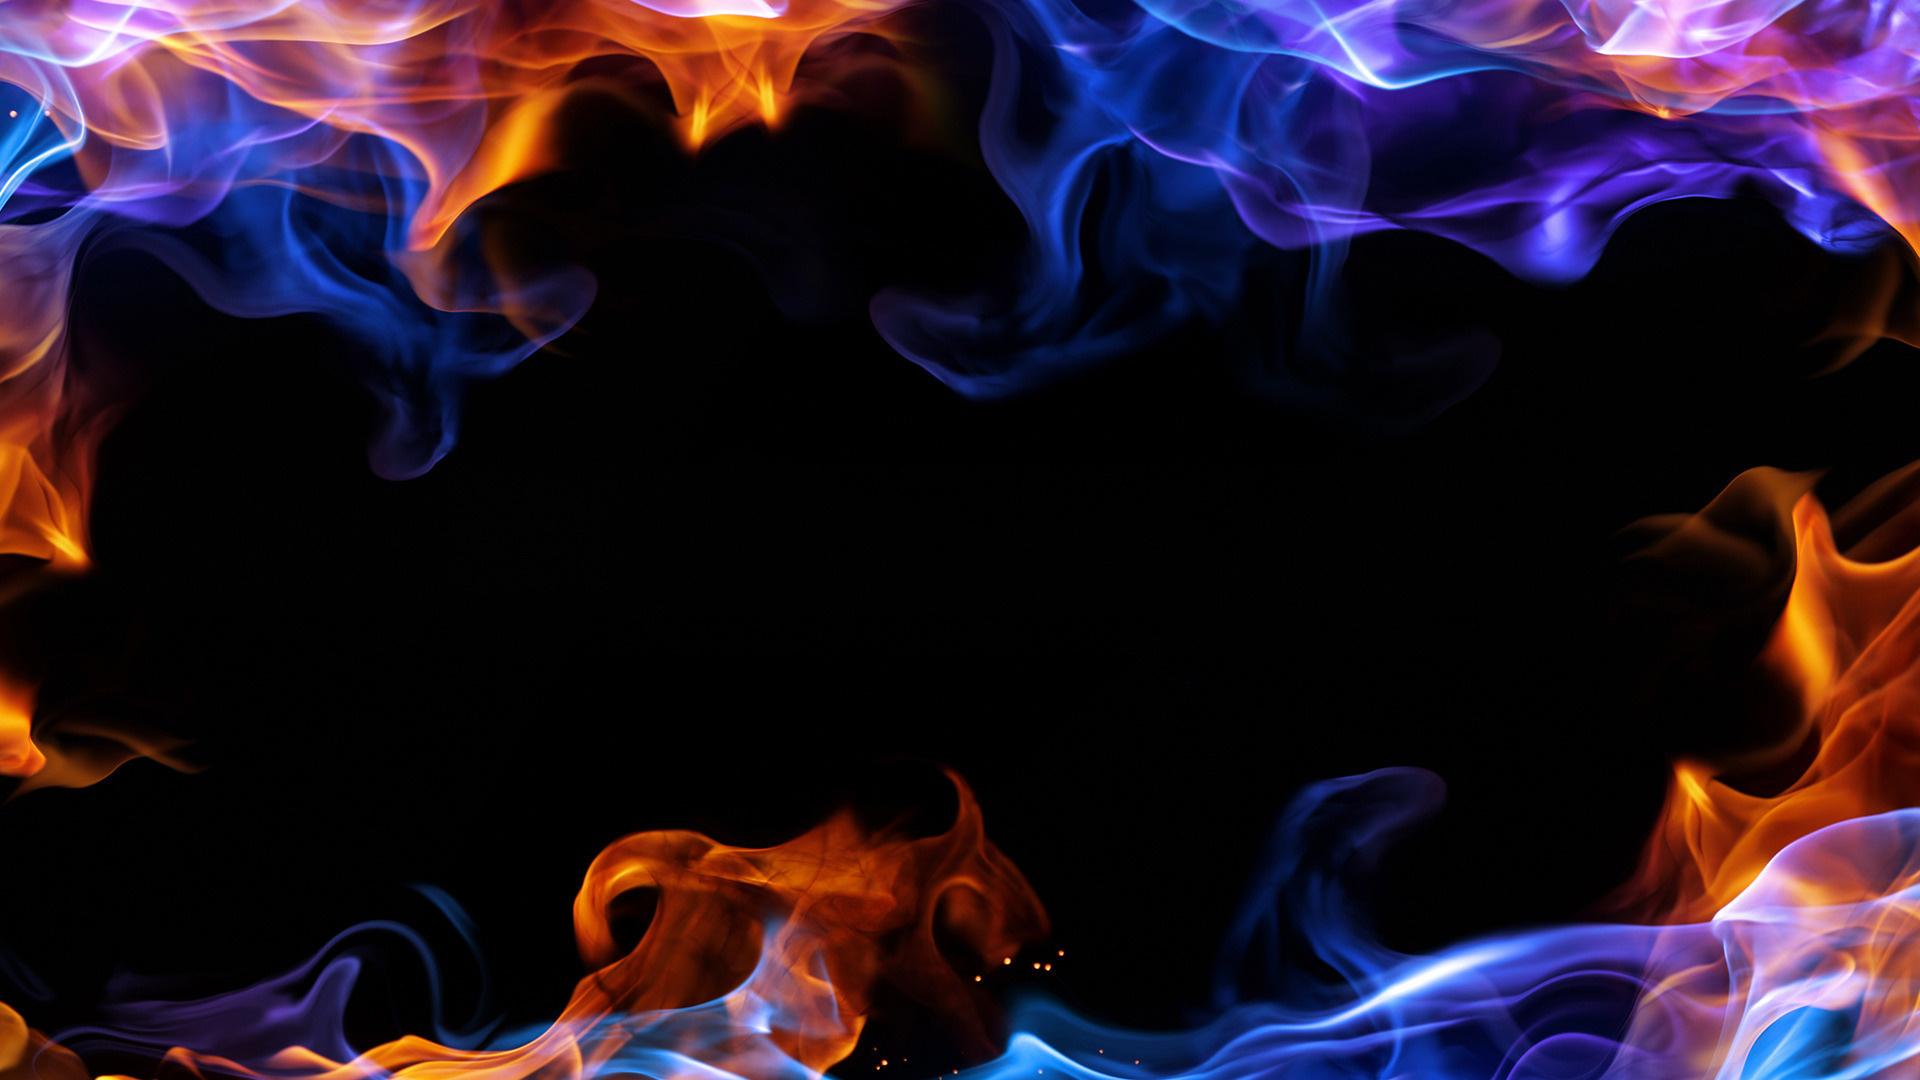 goodwpcom3d16903 smoke fire graphicshtml 1920x1080